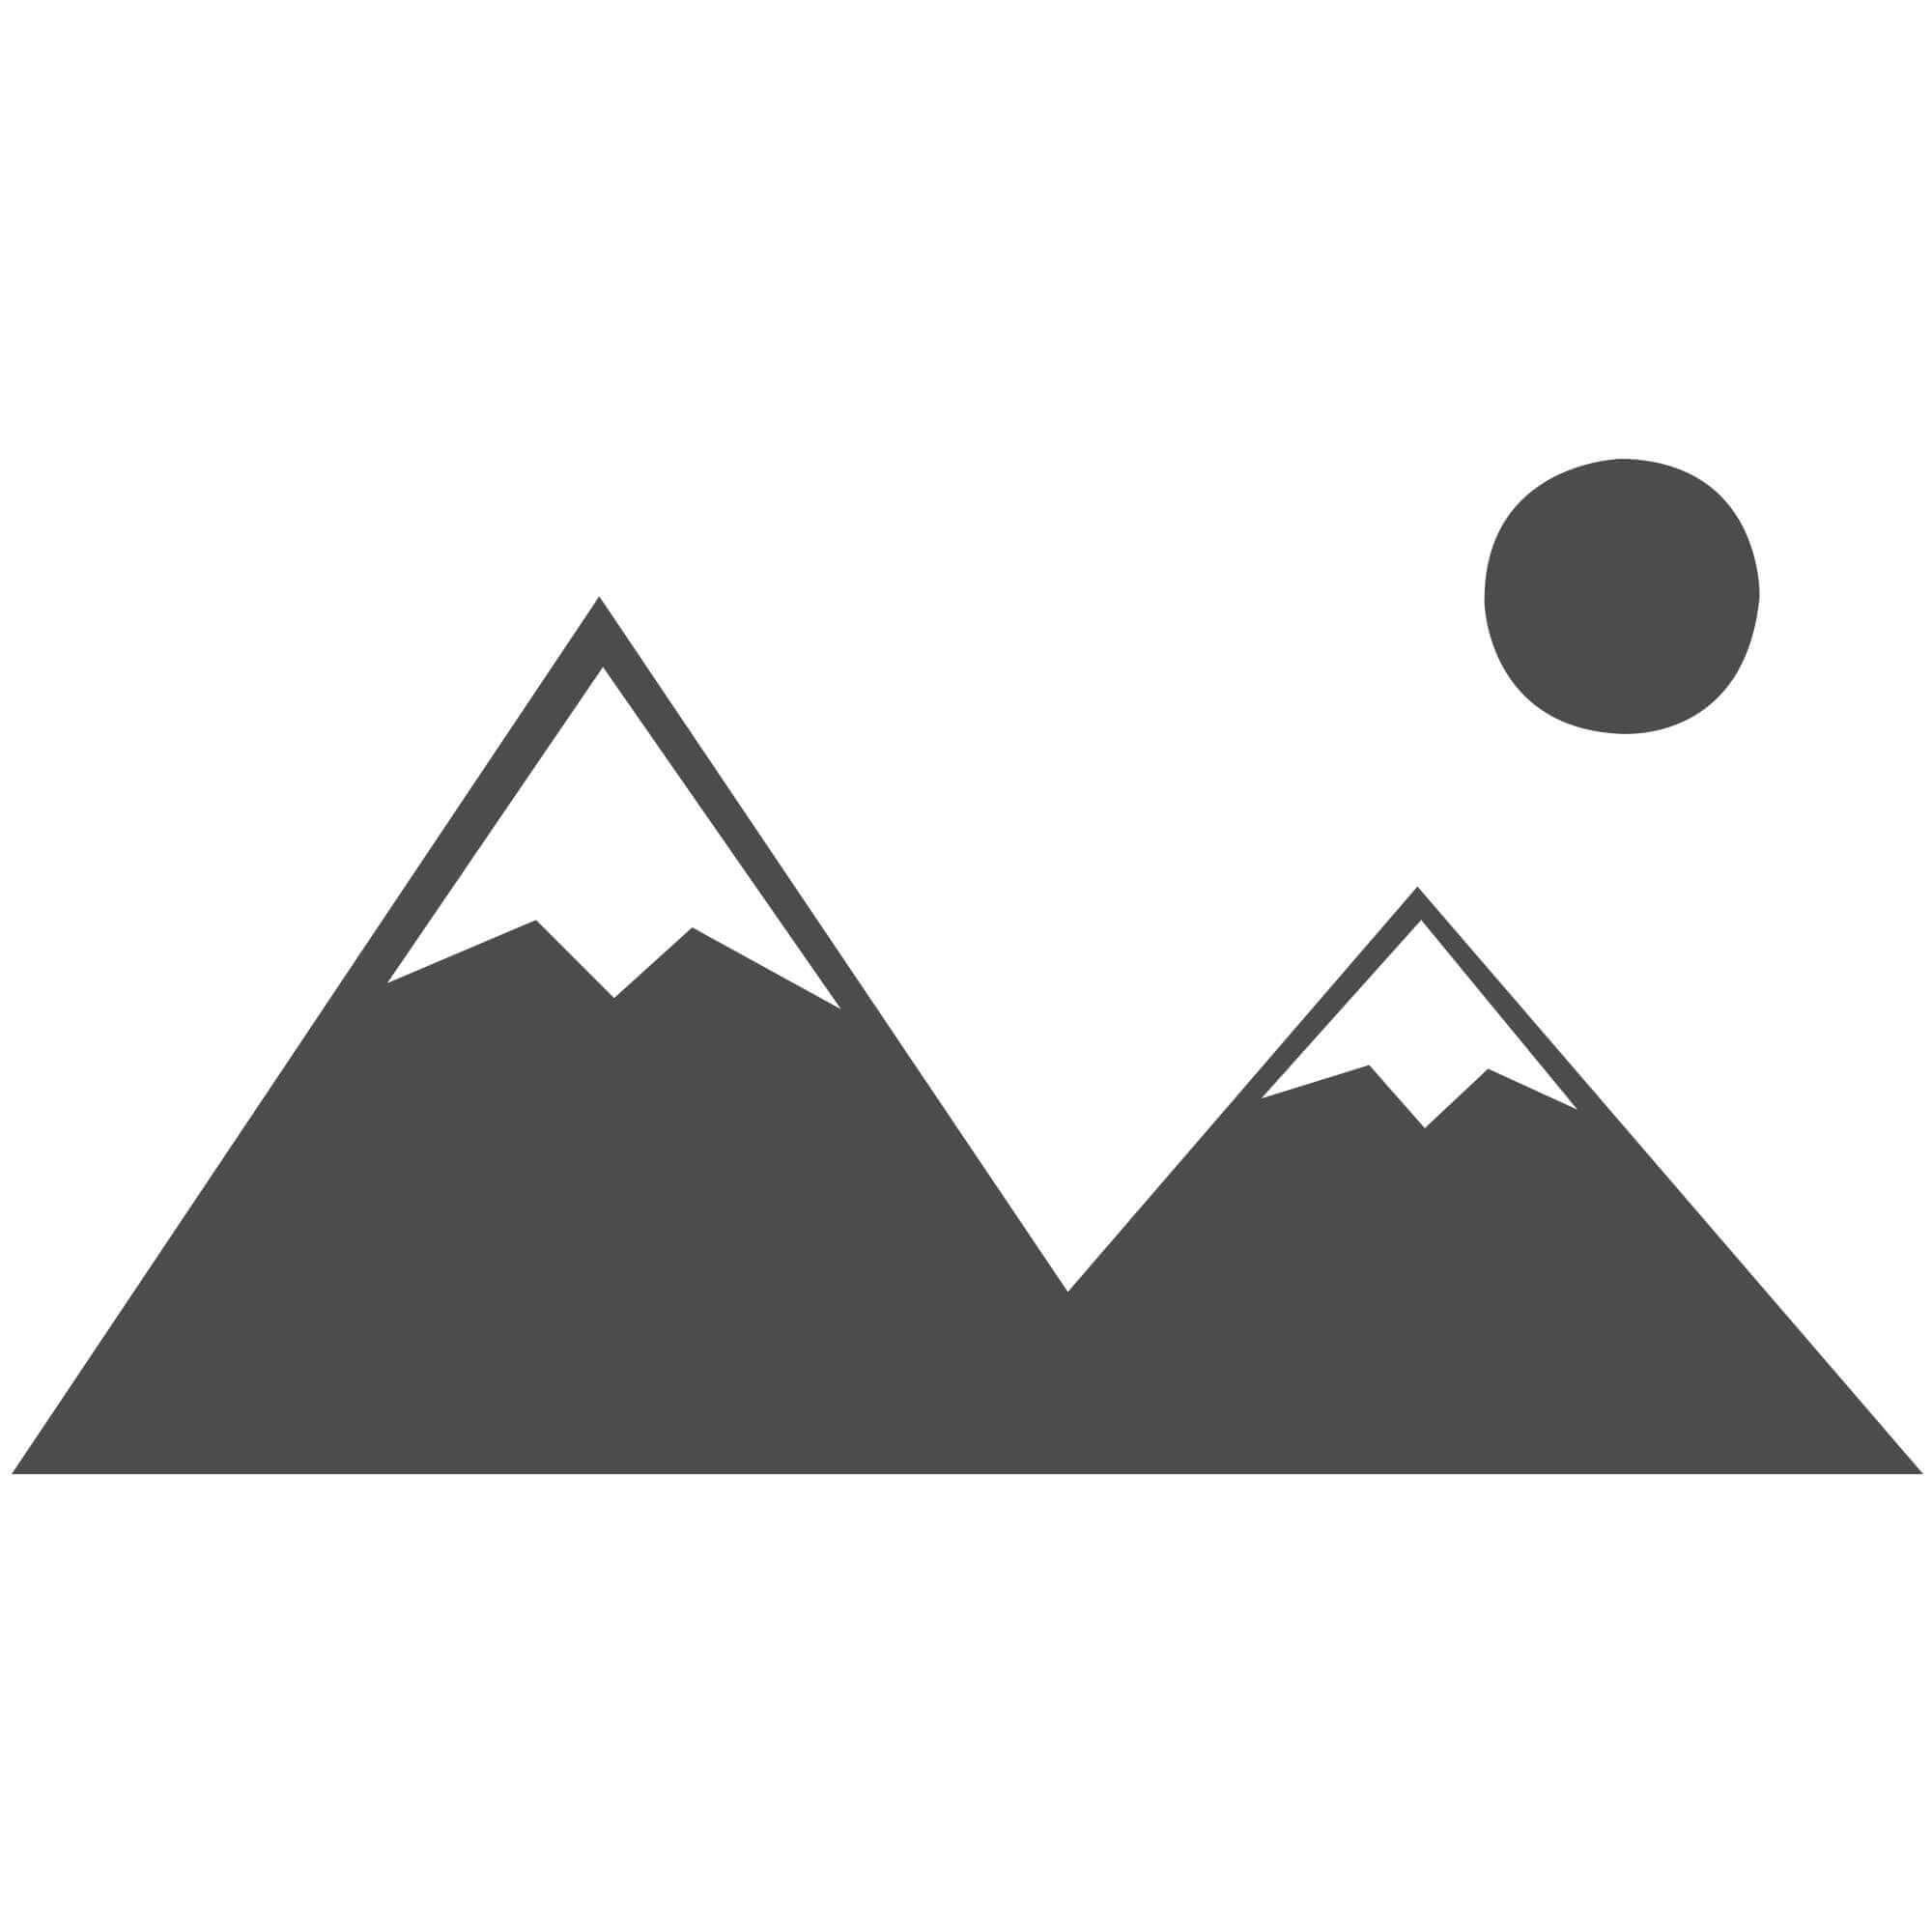 "Softness Shaggy Rug - Mink-60 x 120 cm (2' x 3'11"")"